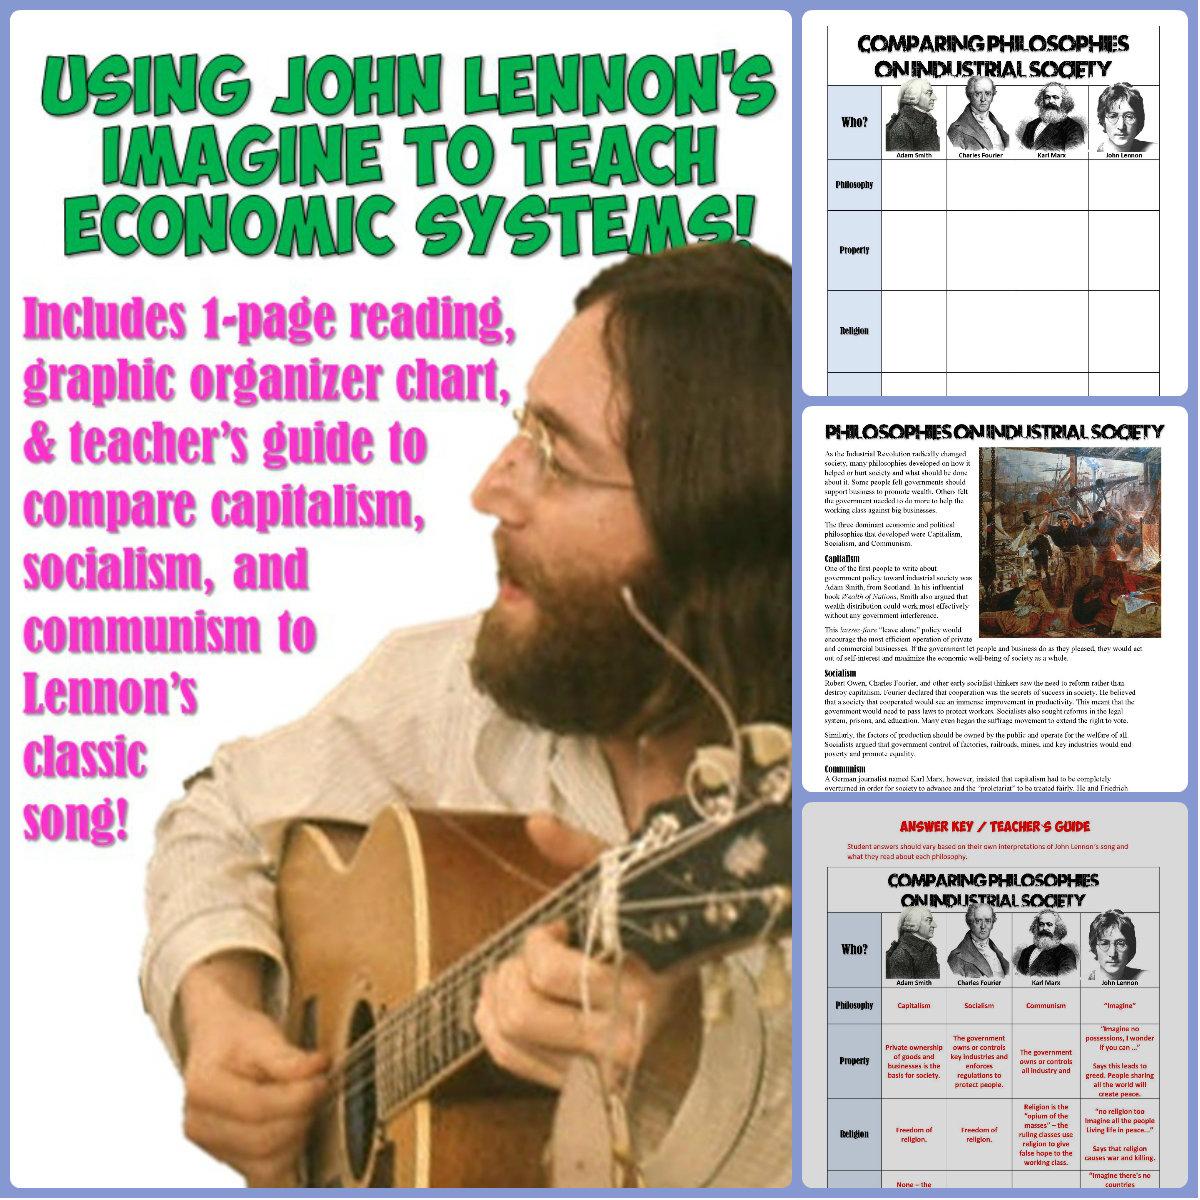 Students Of History Use John Lennon S Imagine To Teach Communism Capitalism Amp Socialism Lesson